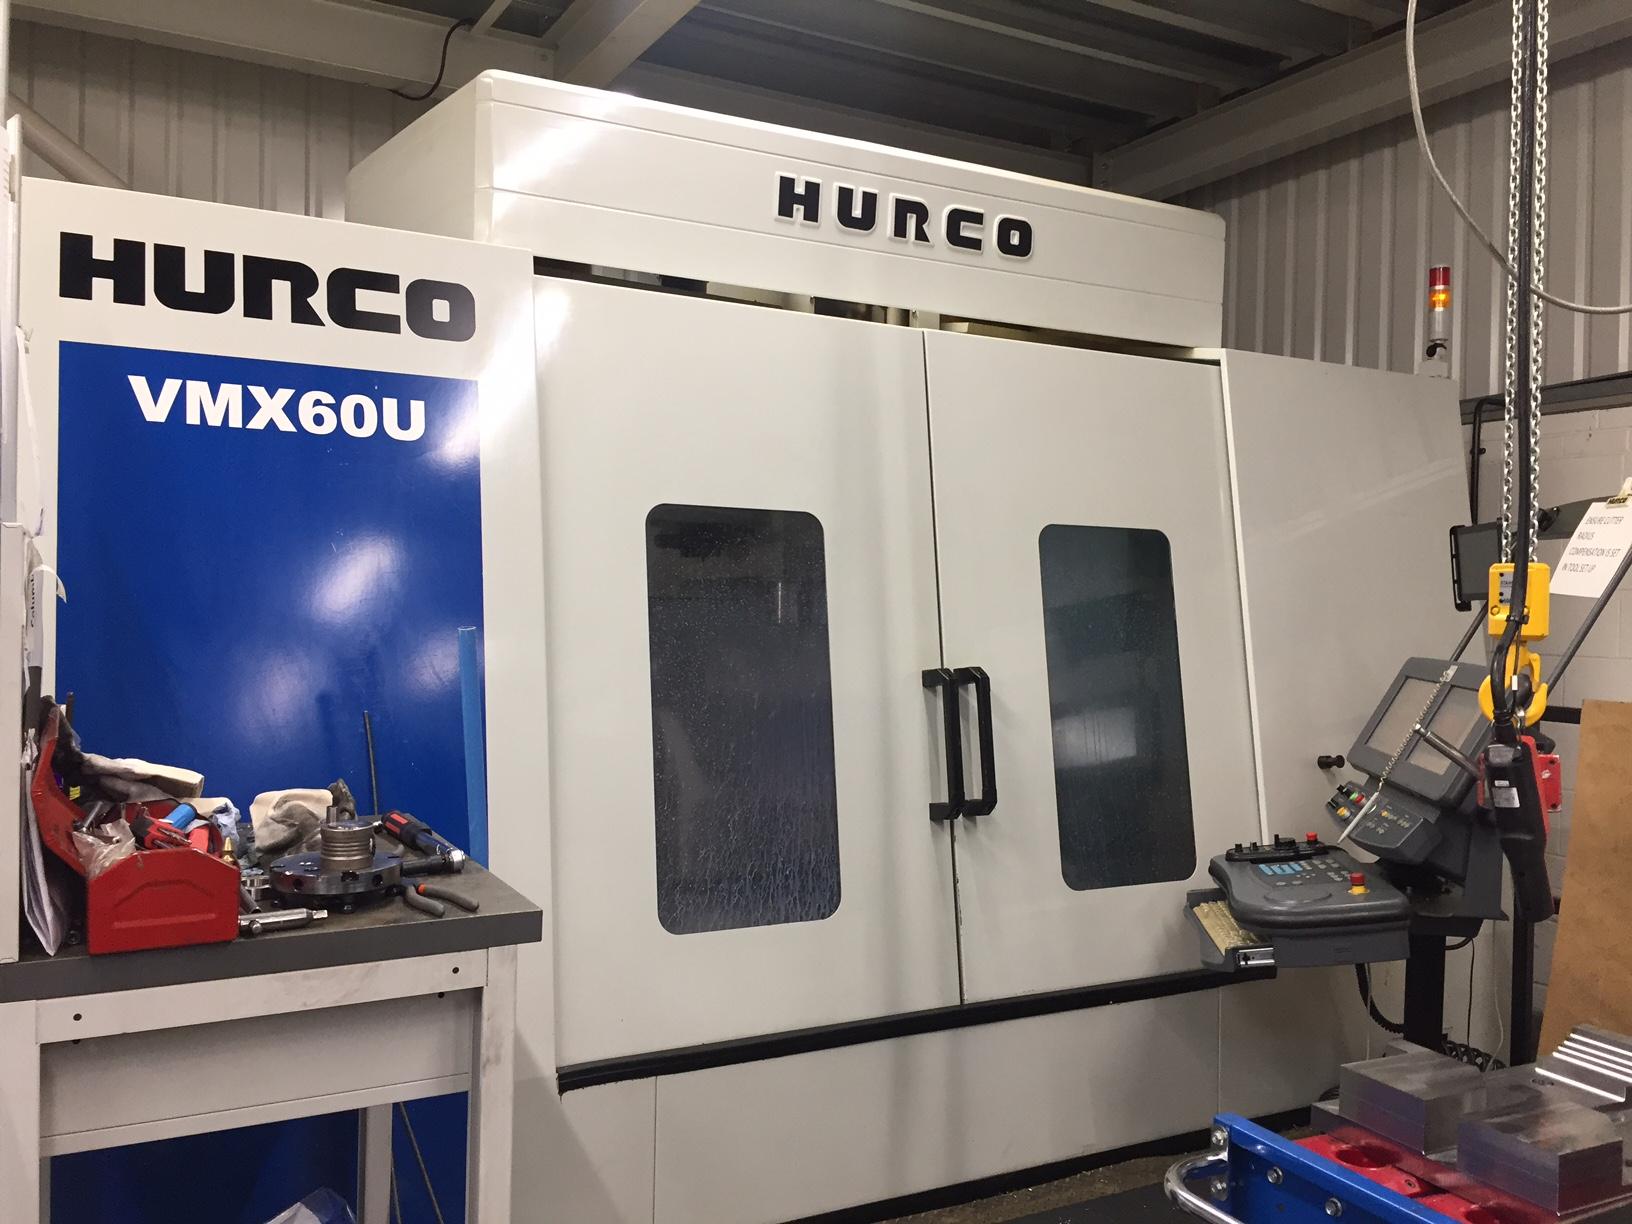 HURCO 5 axis VMX60U (1525mm in X) , manufactured 10/2011